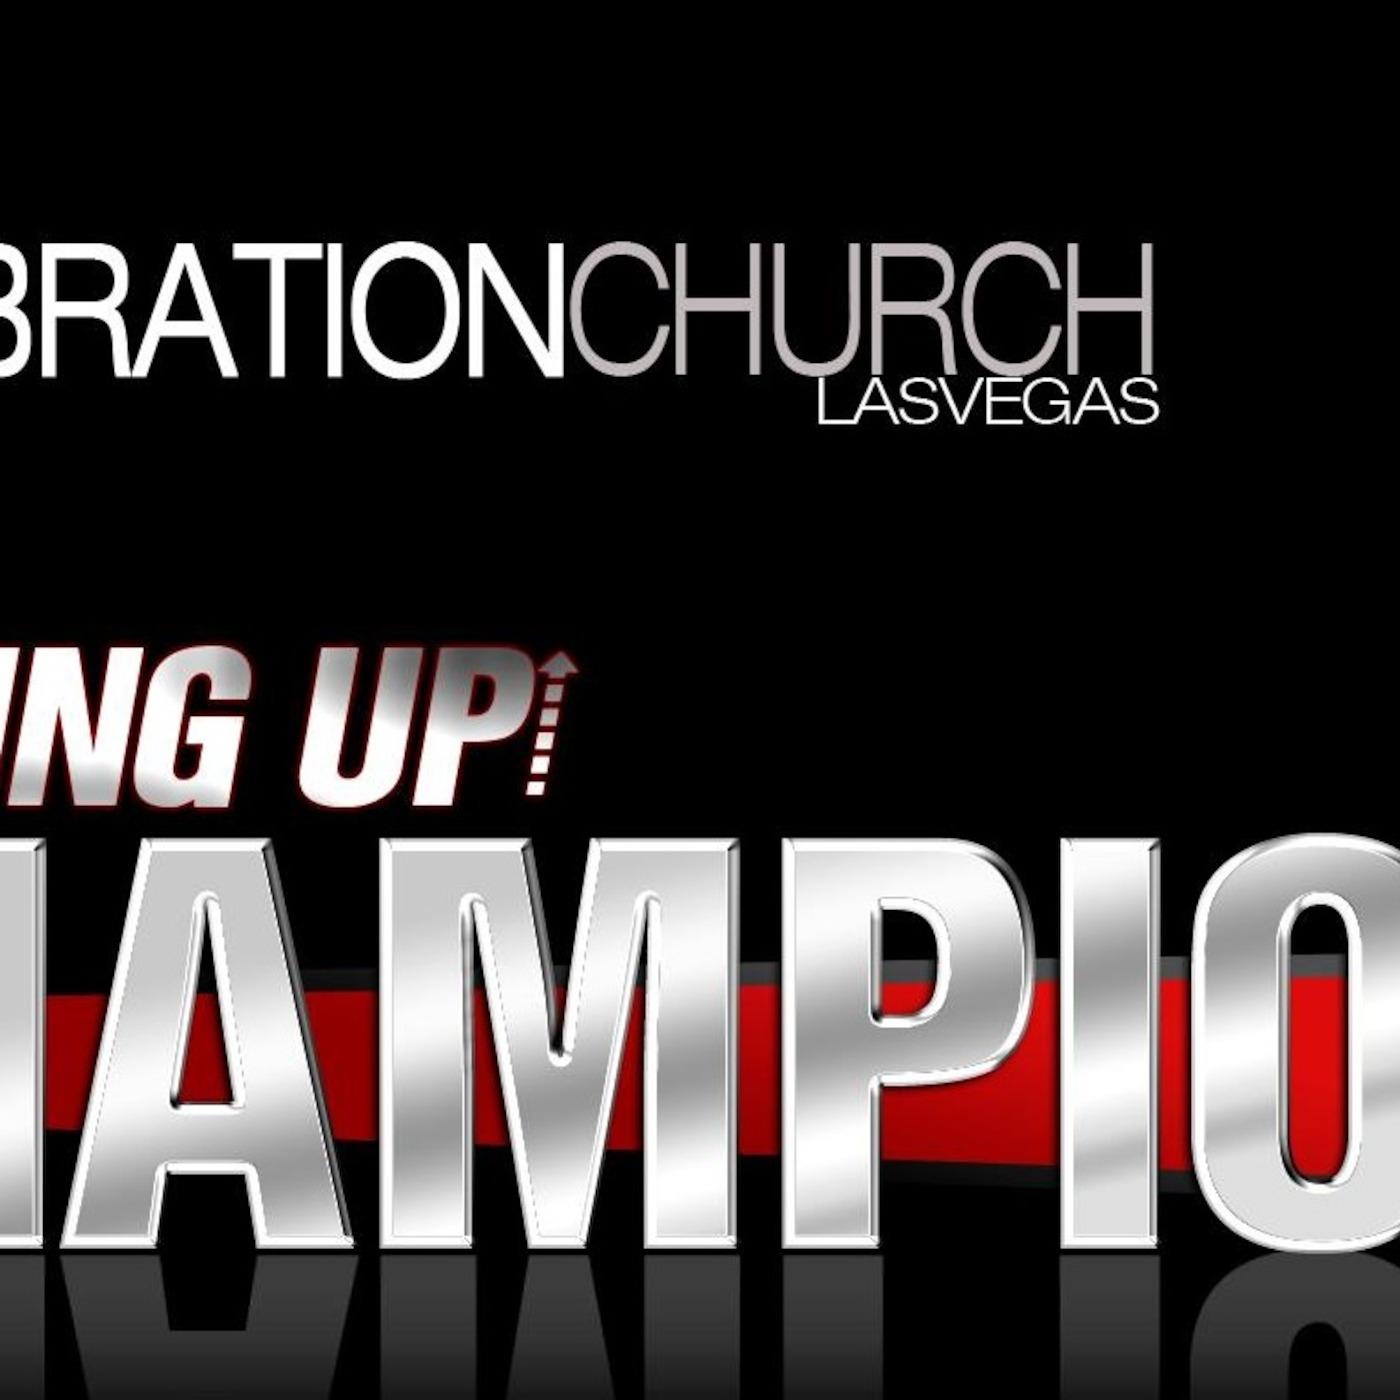 Celebration Church Las Vegas' Podcast